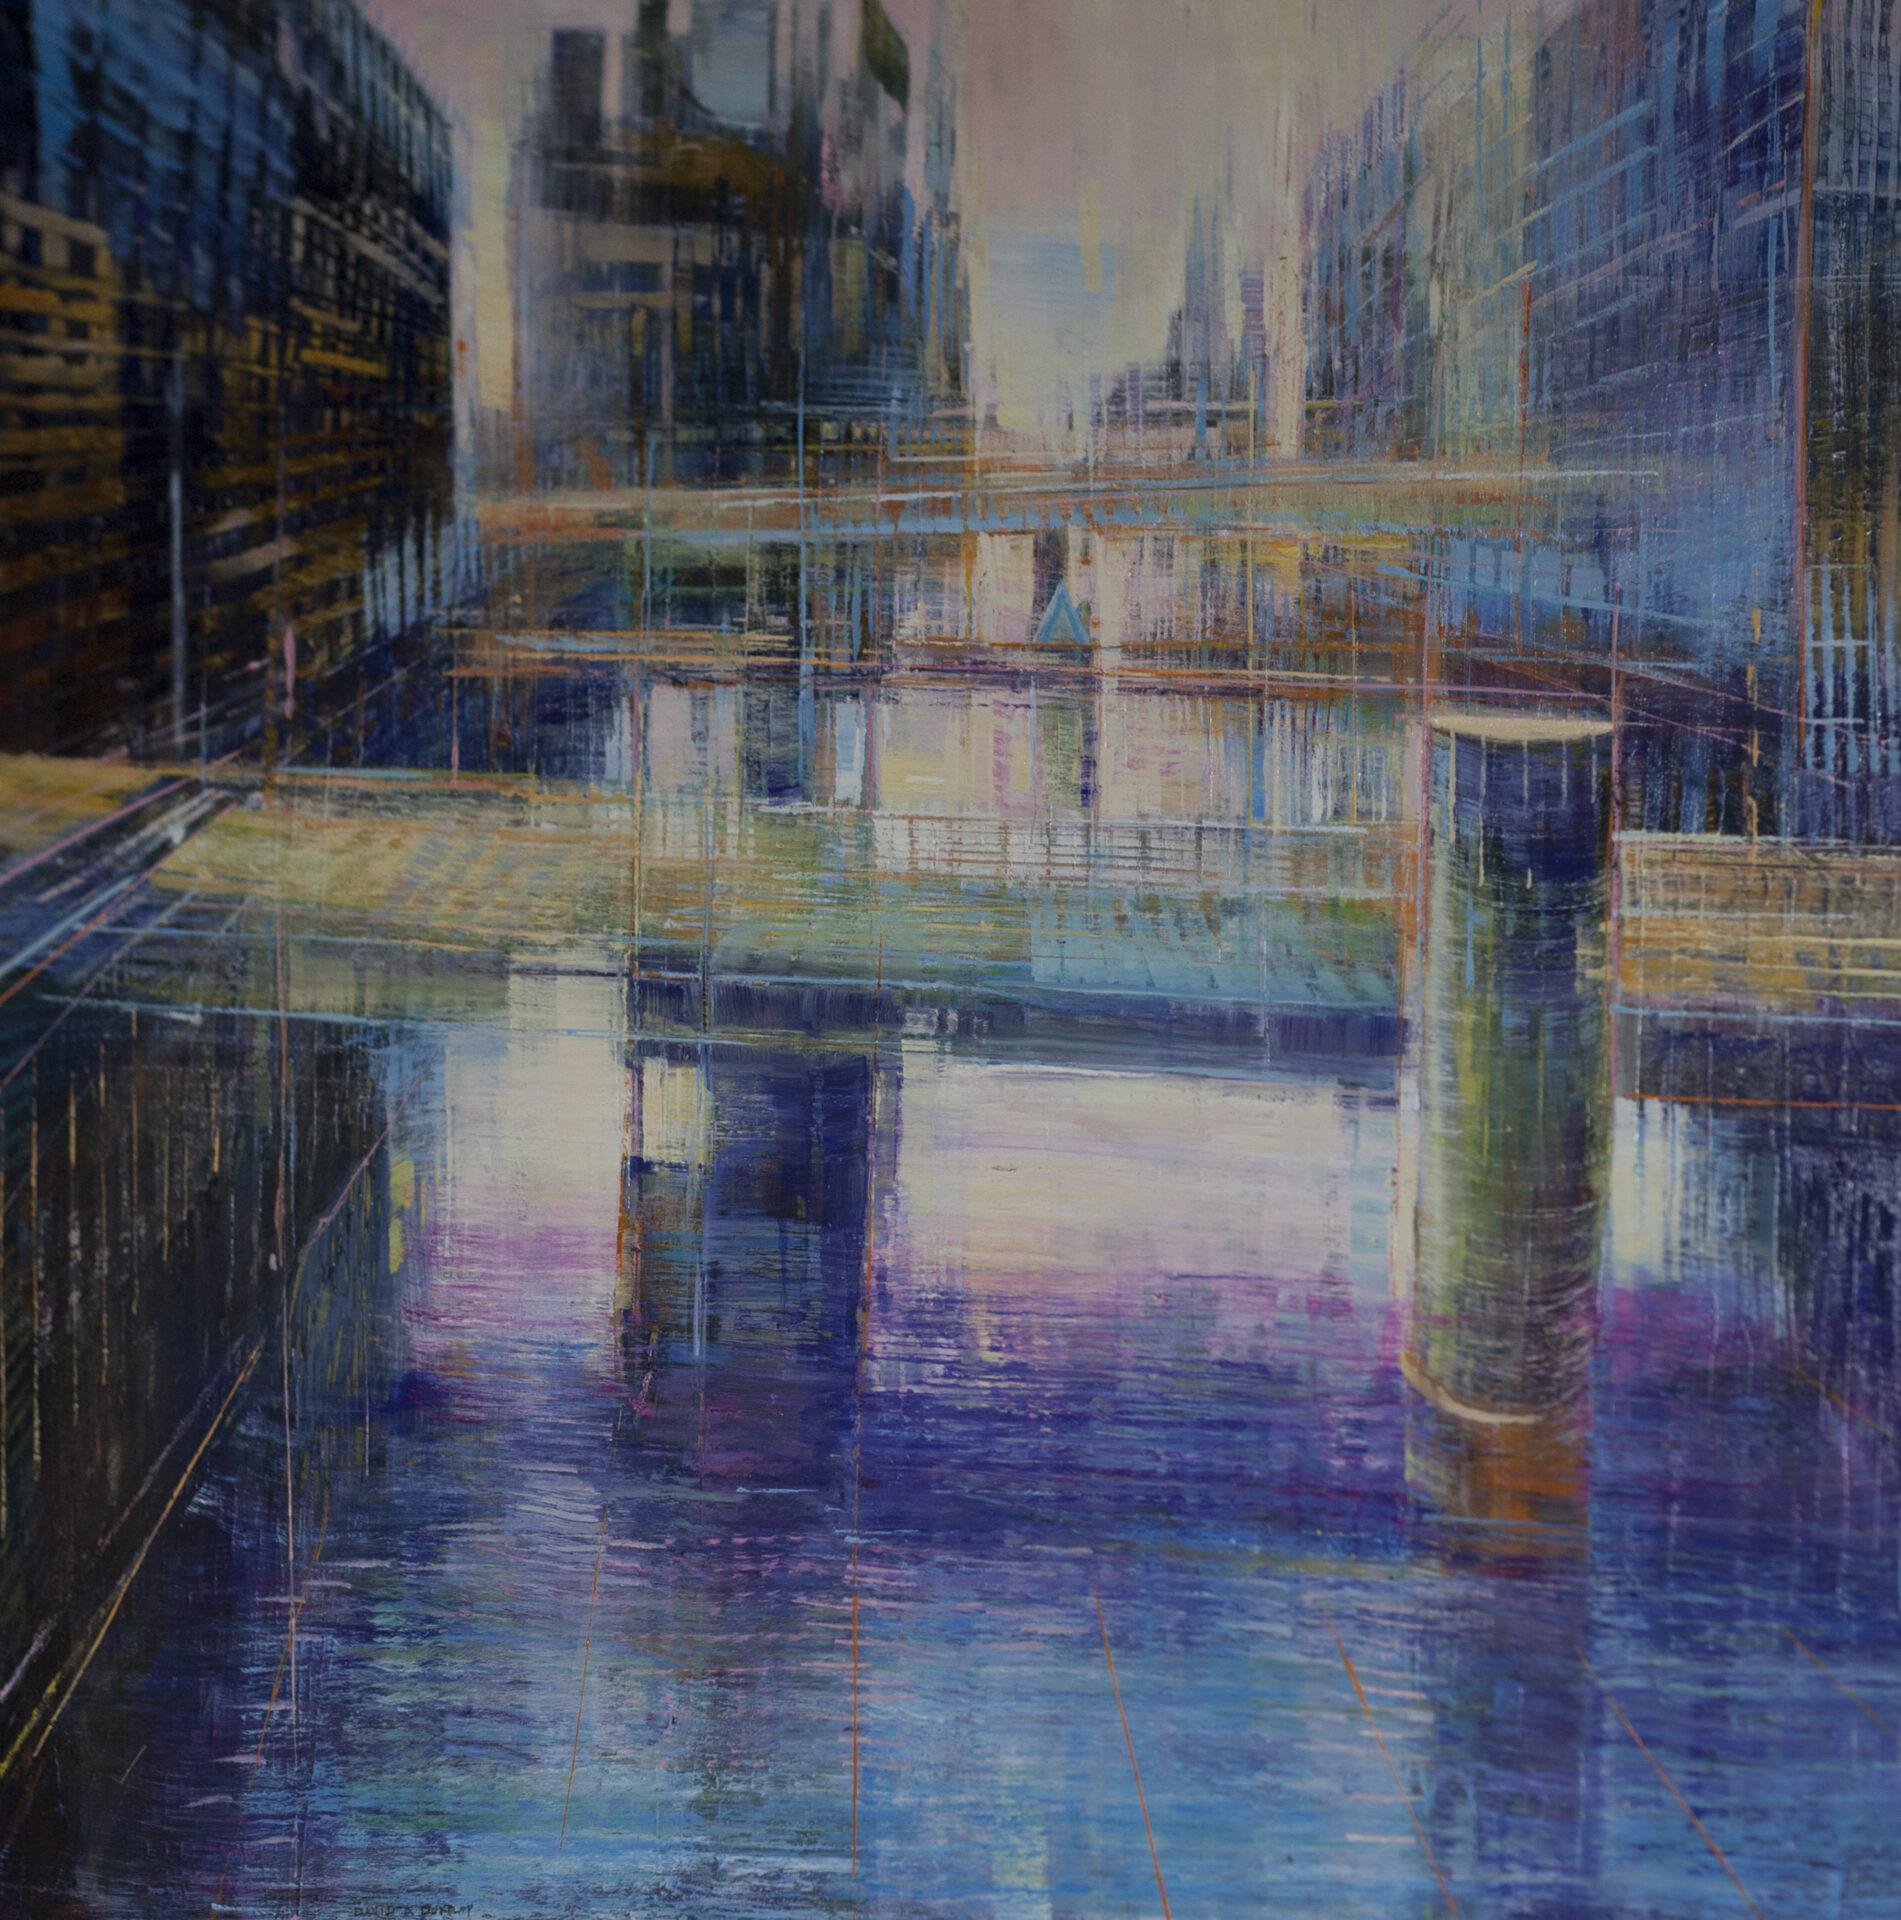 David Dunlop - Milwaukee Building Bridges